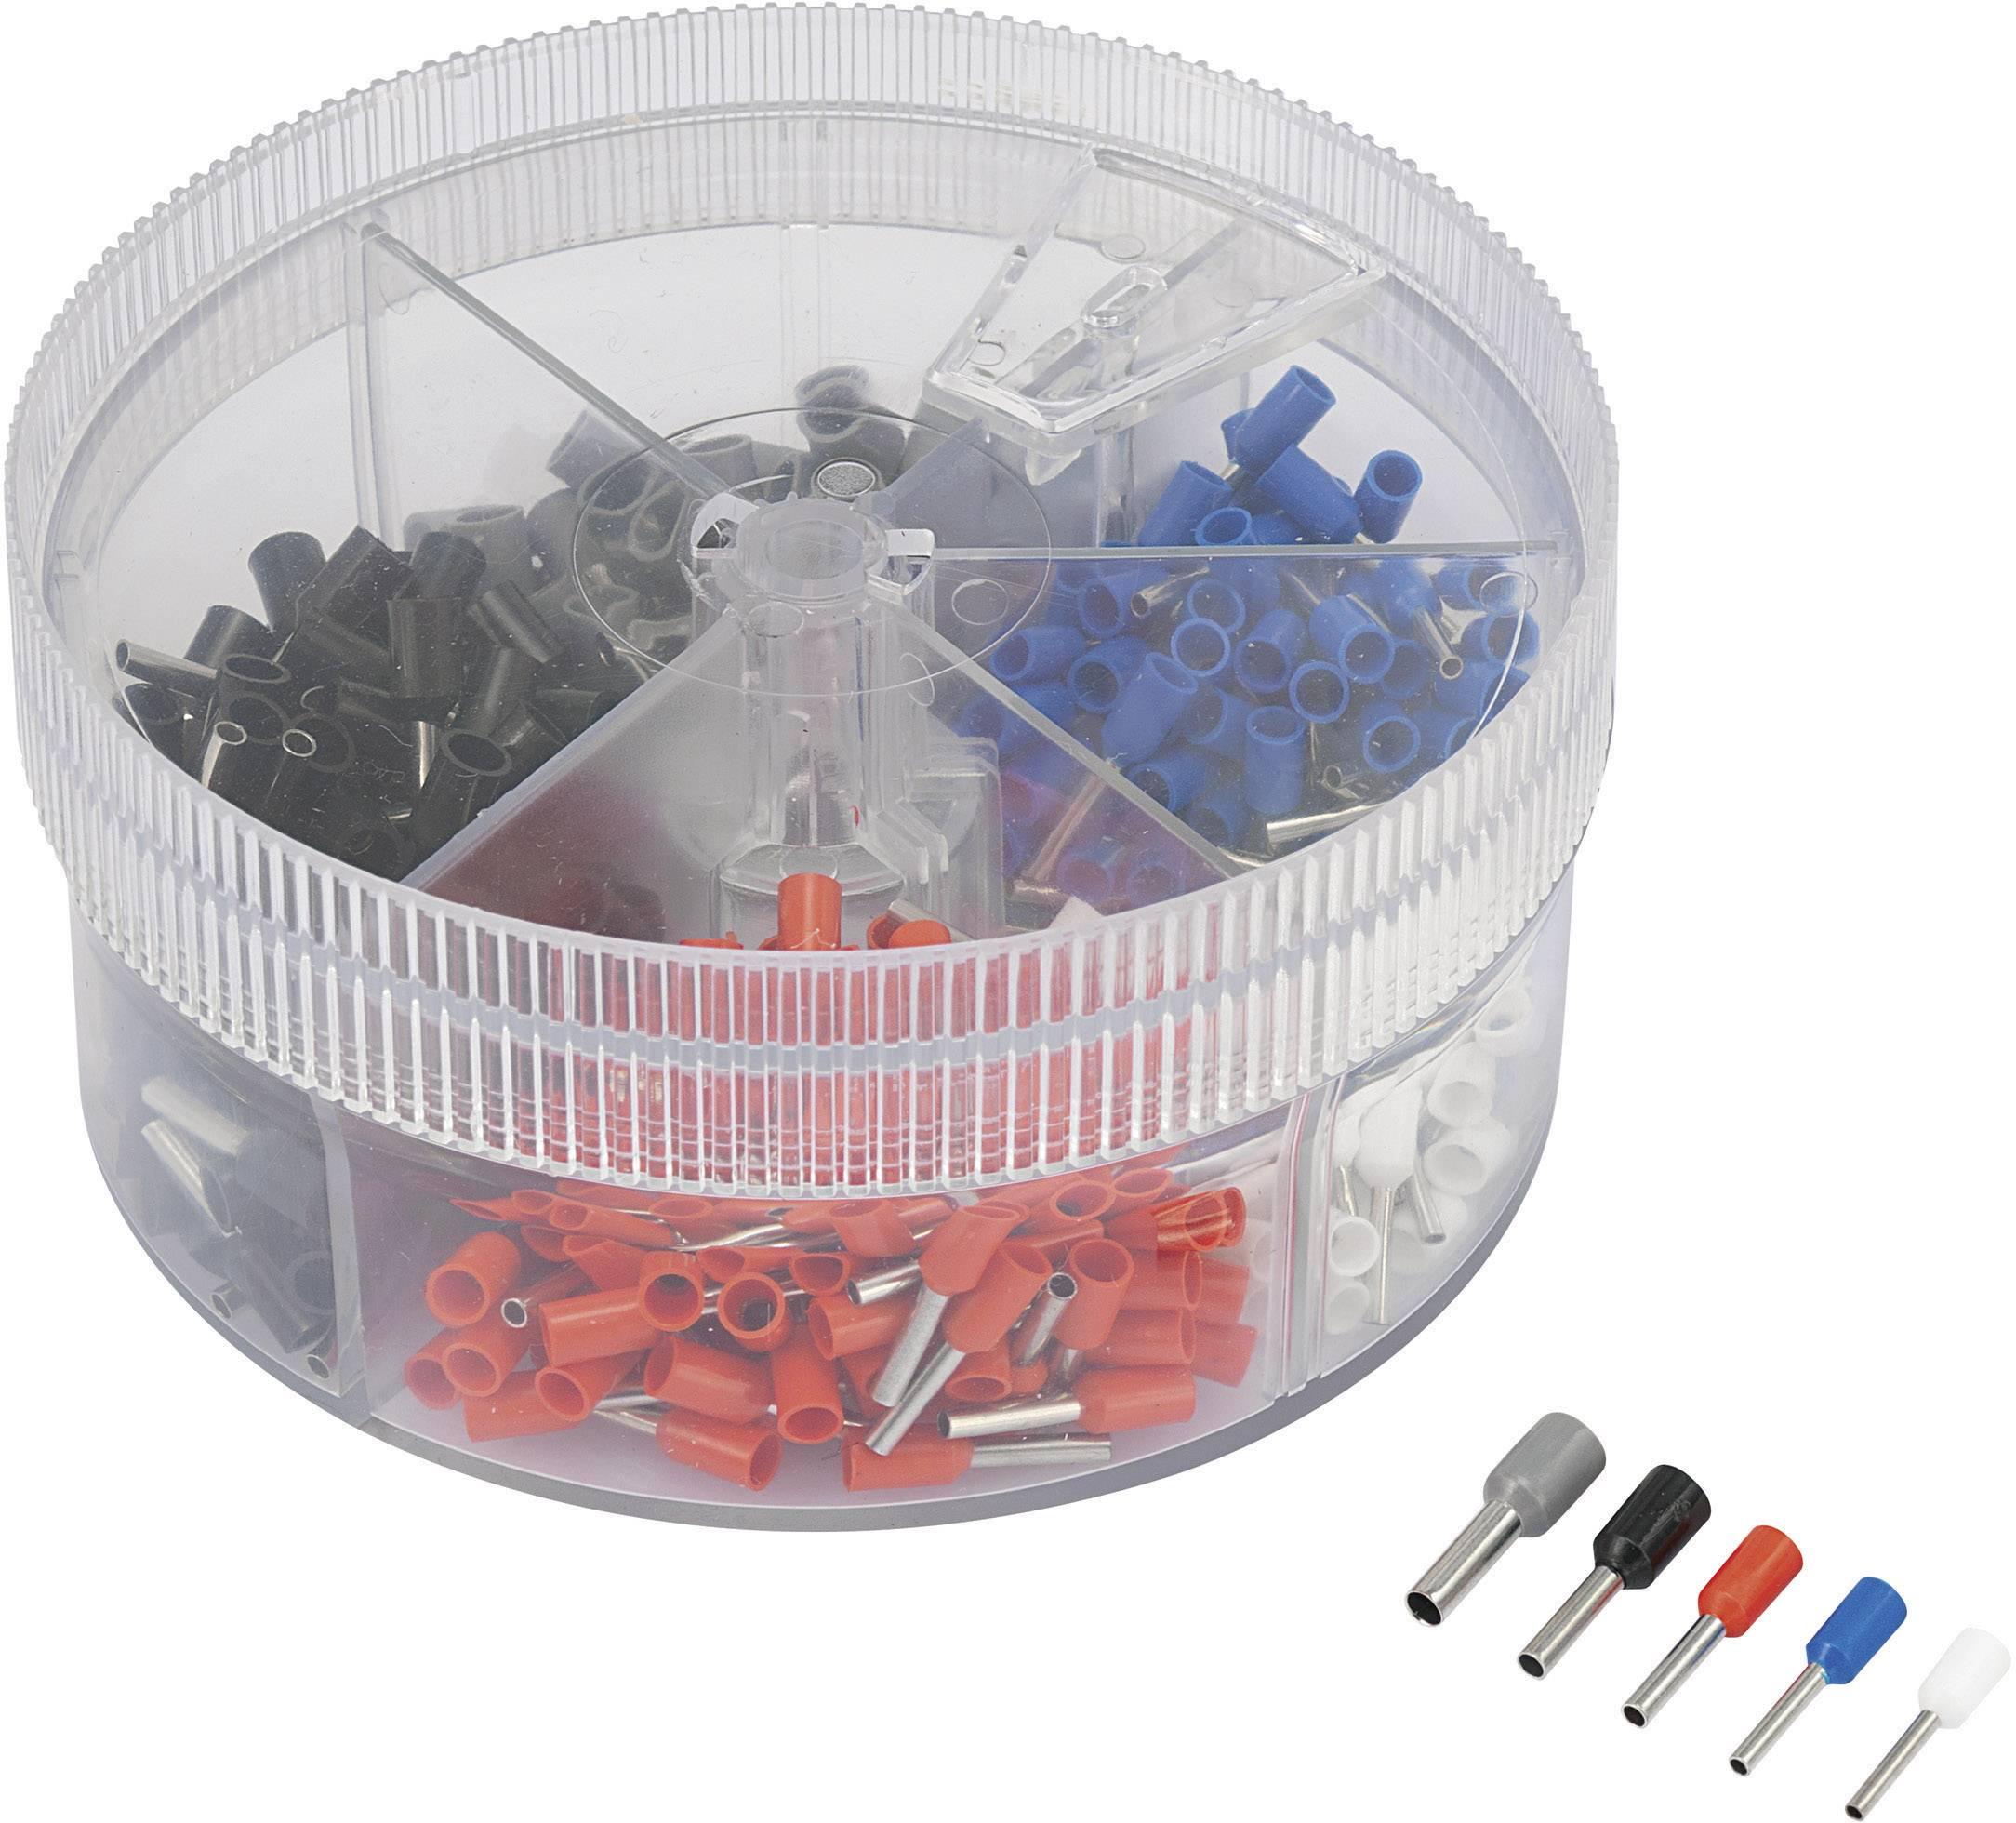 Sada dutinek TRU COMPONENTS 739872 0.50 mm² - 2.50 mm², bílá, modrá, červená, černá, šedá, 400 ks